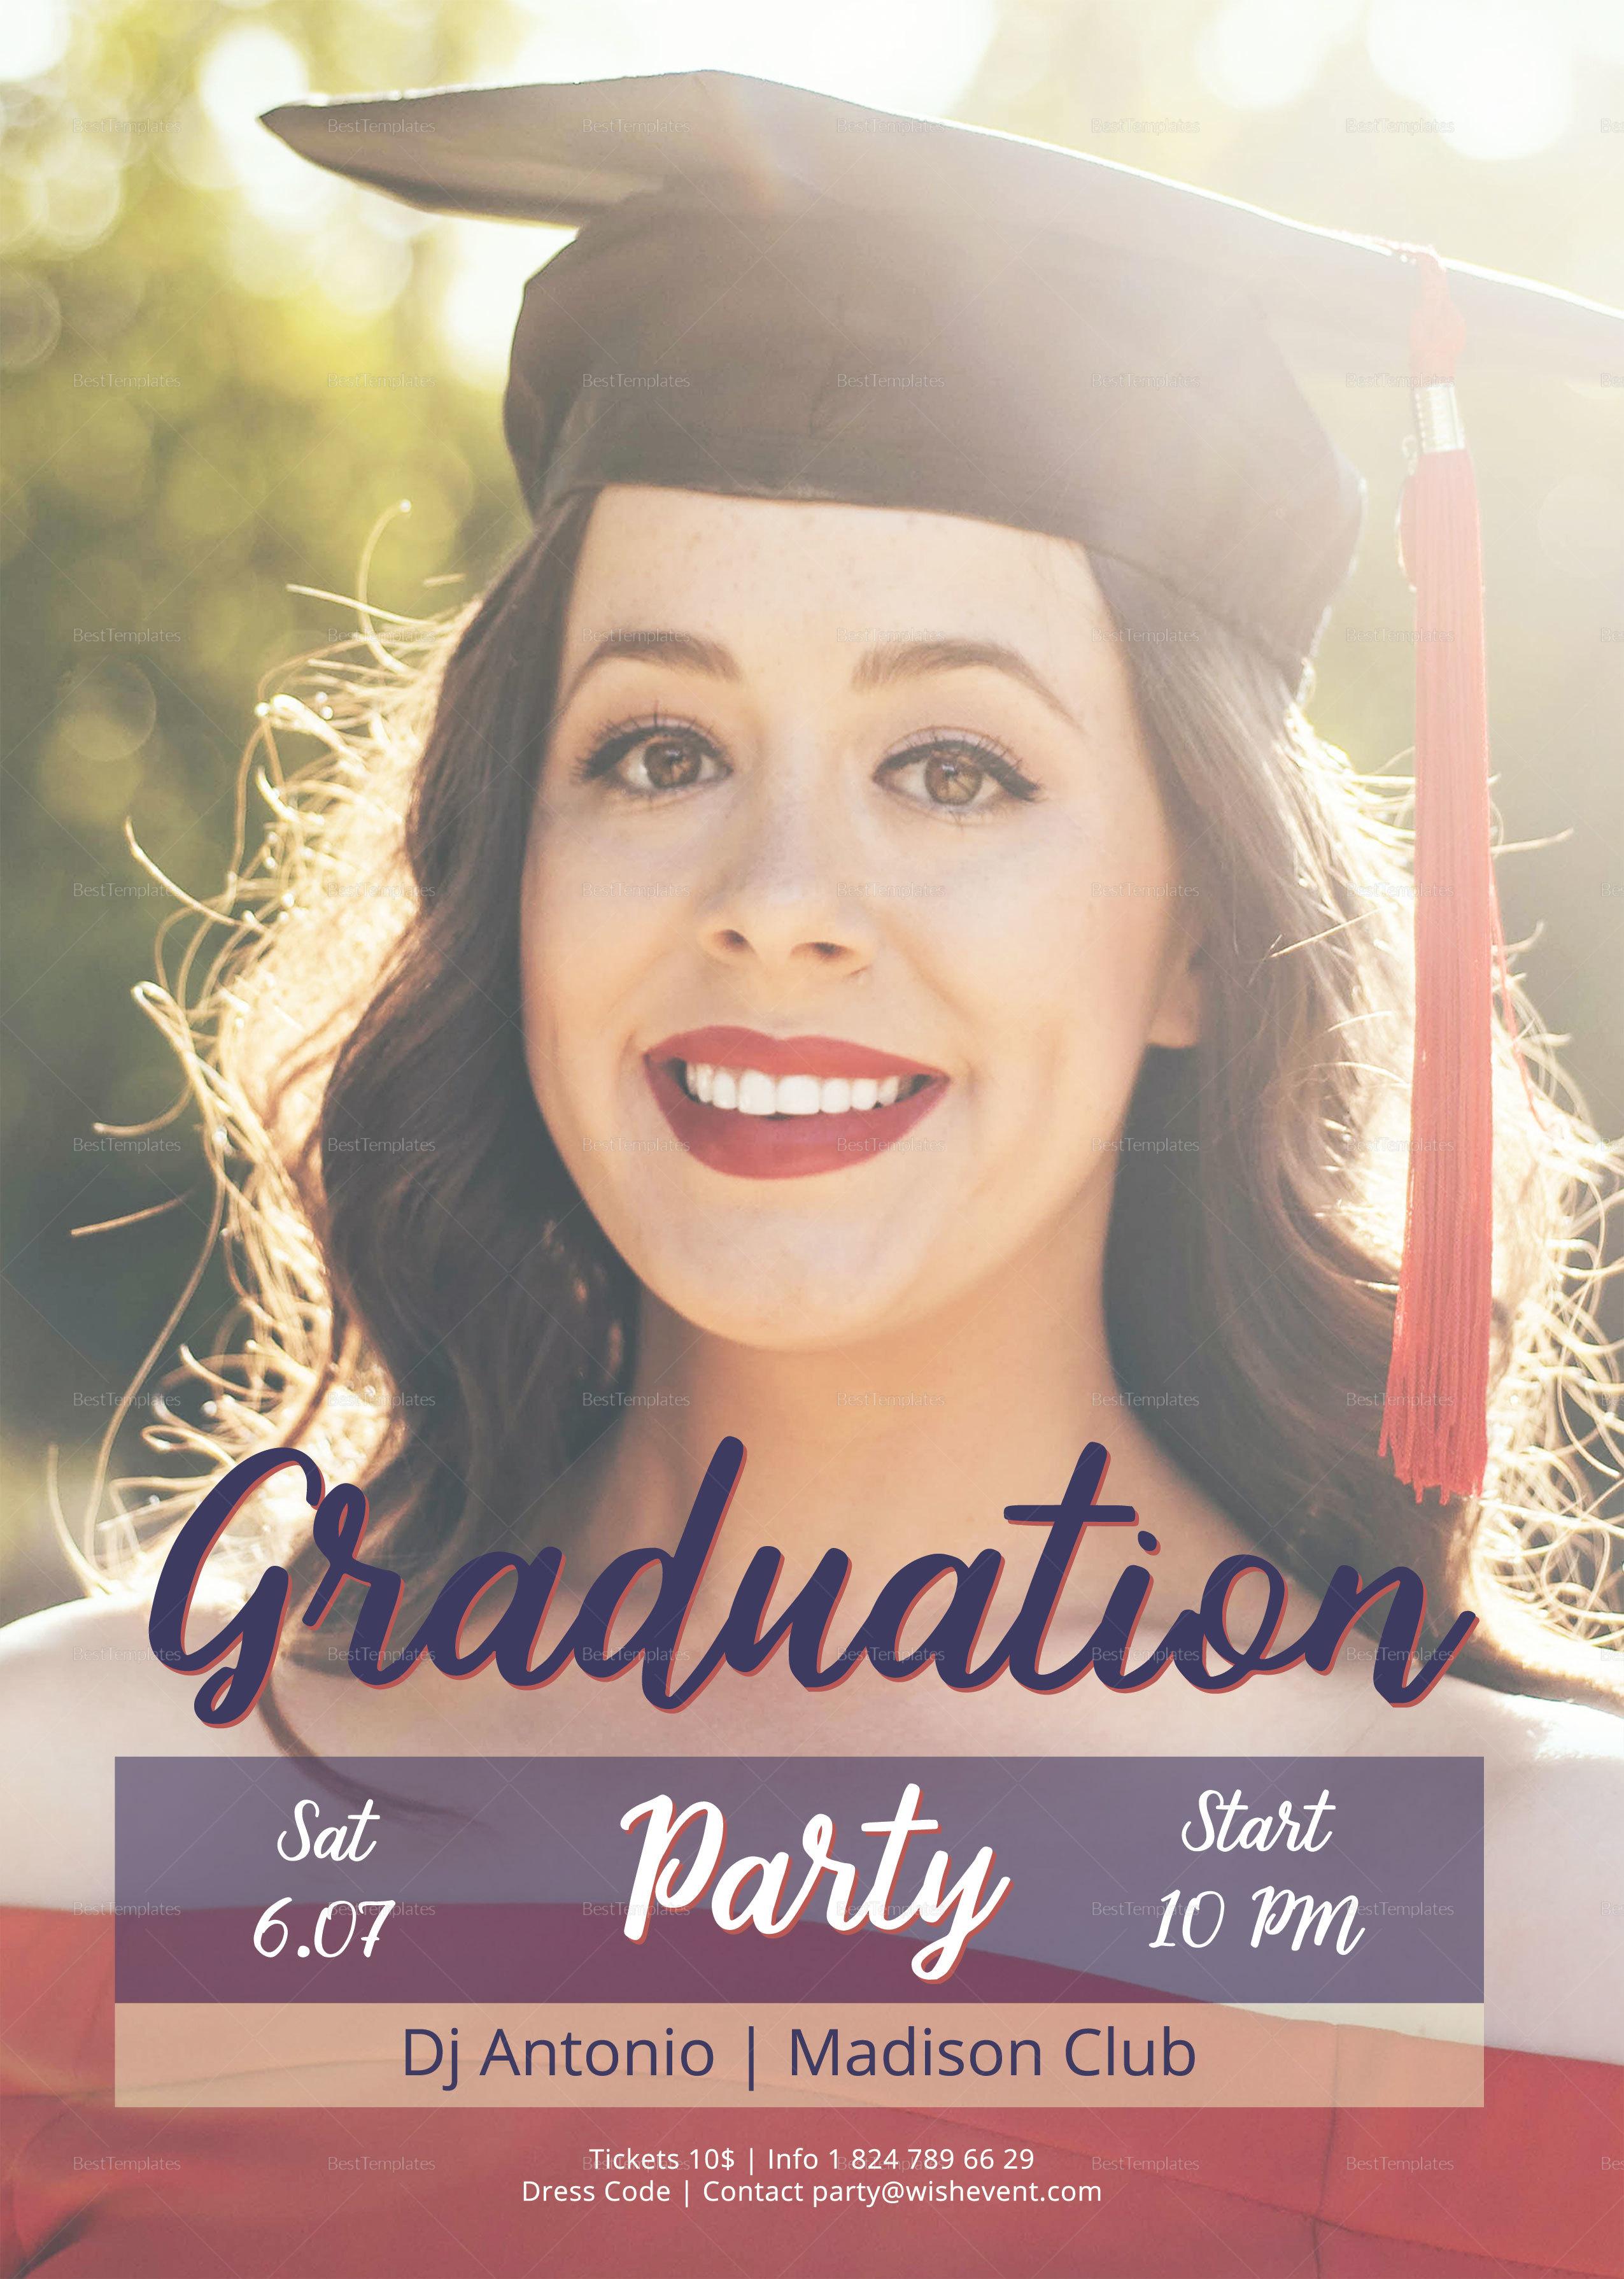 Graduation Night Party Flyer